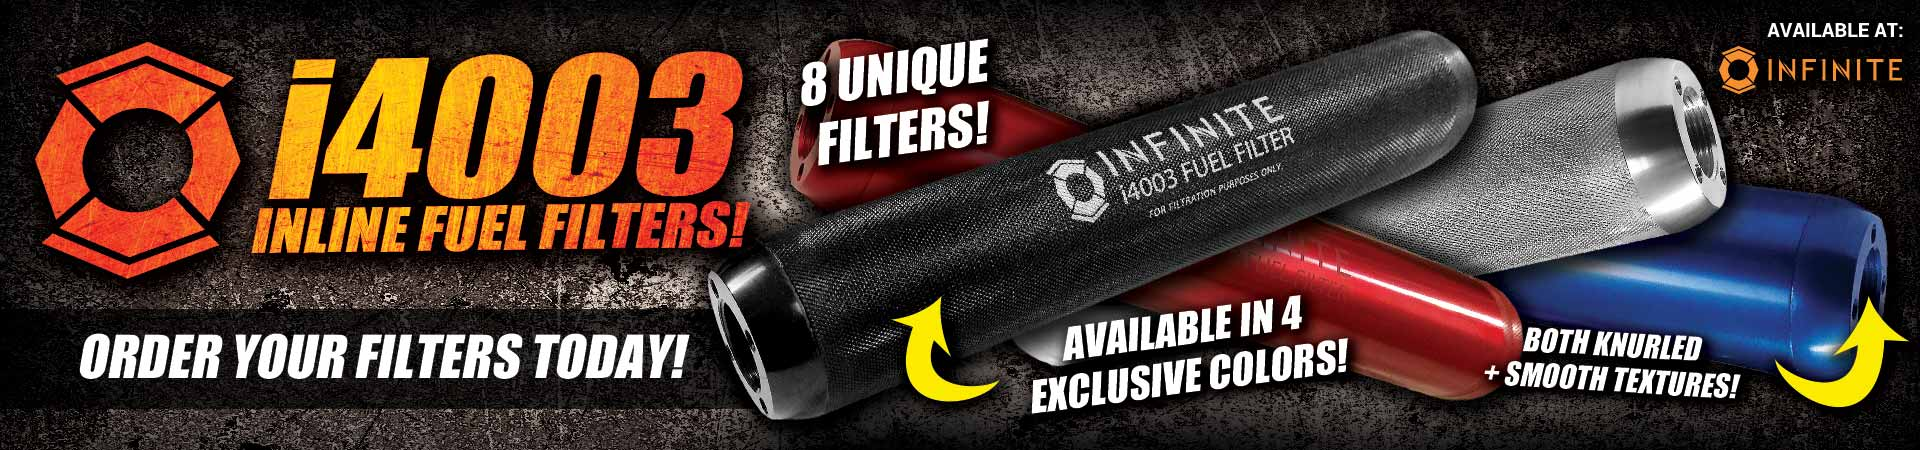 new-filters.jpg